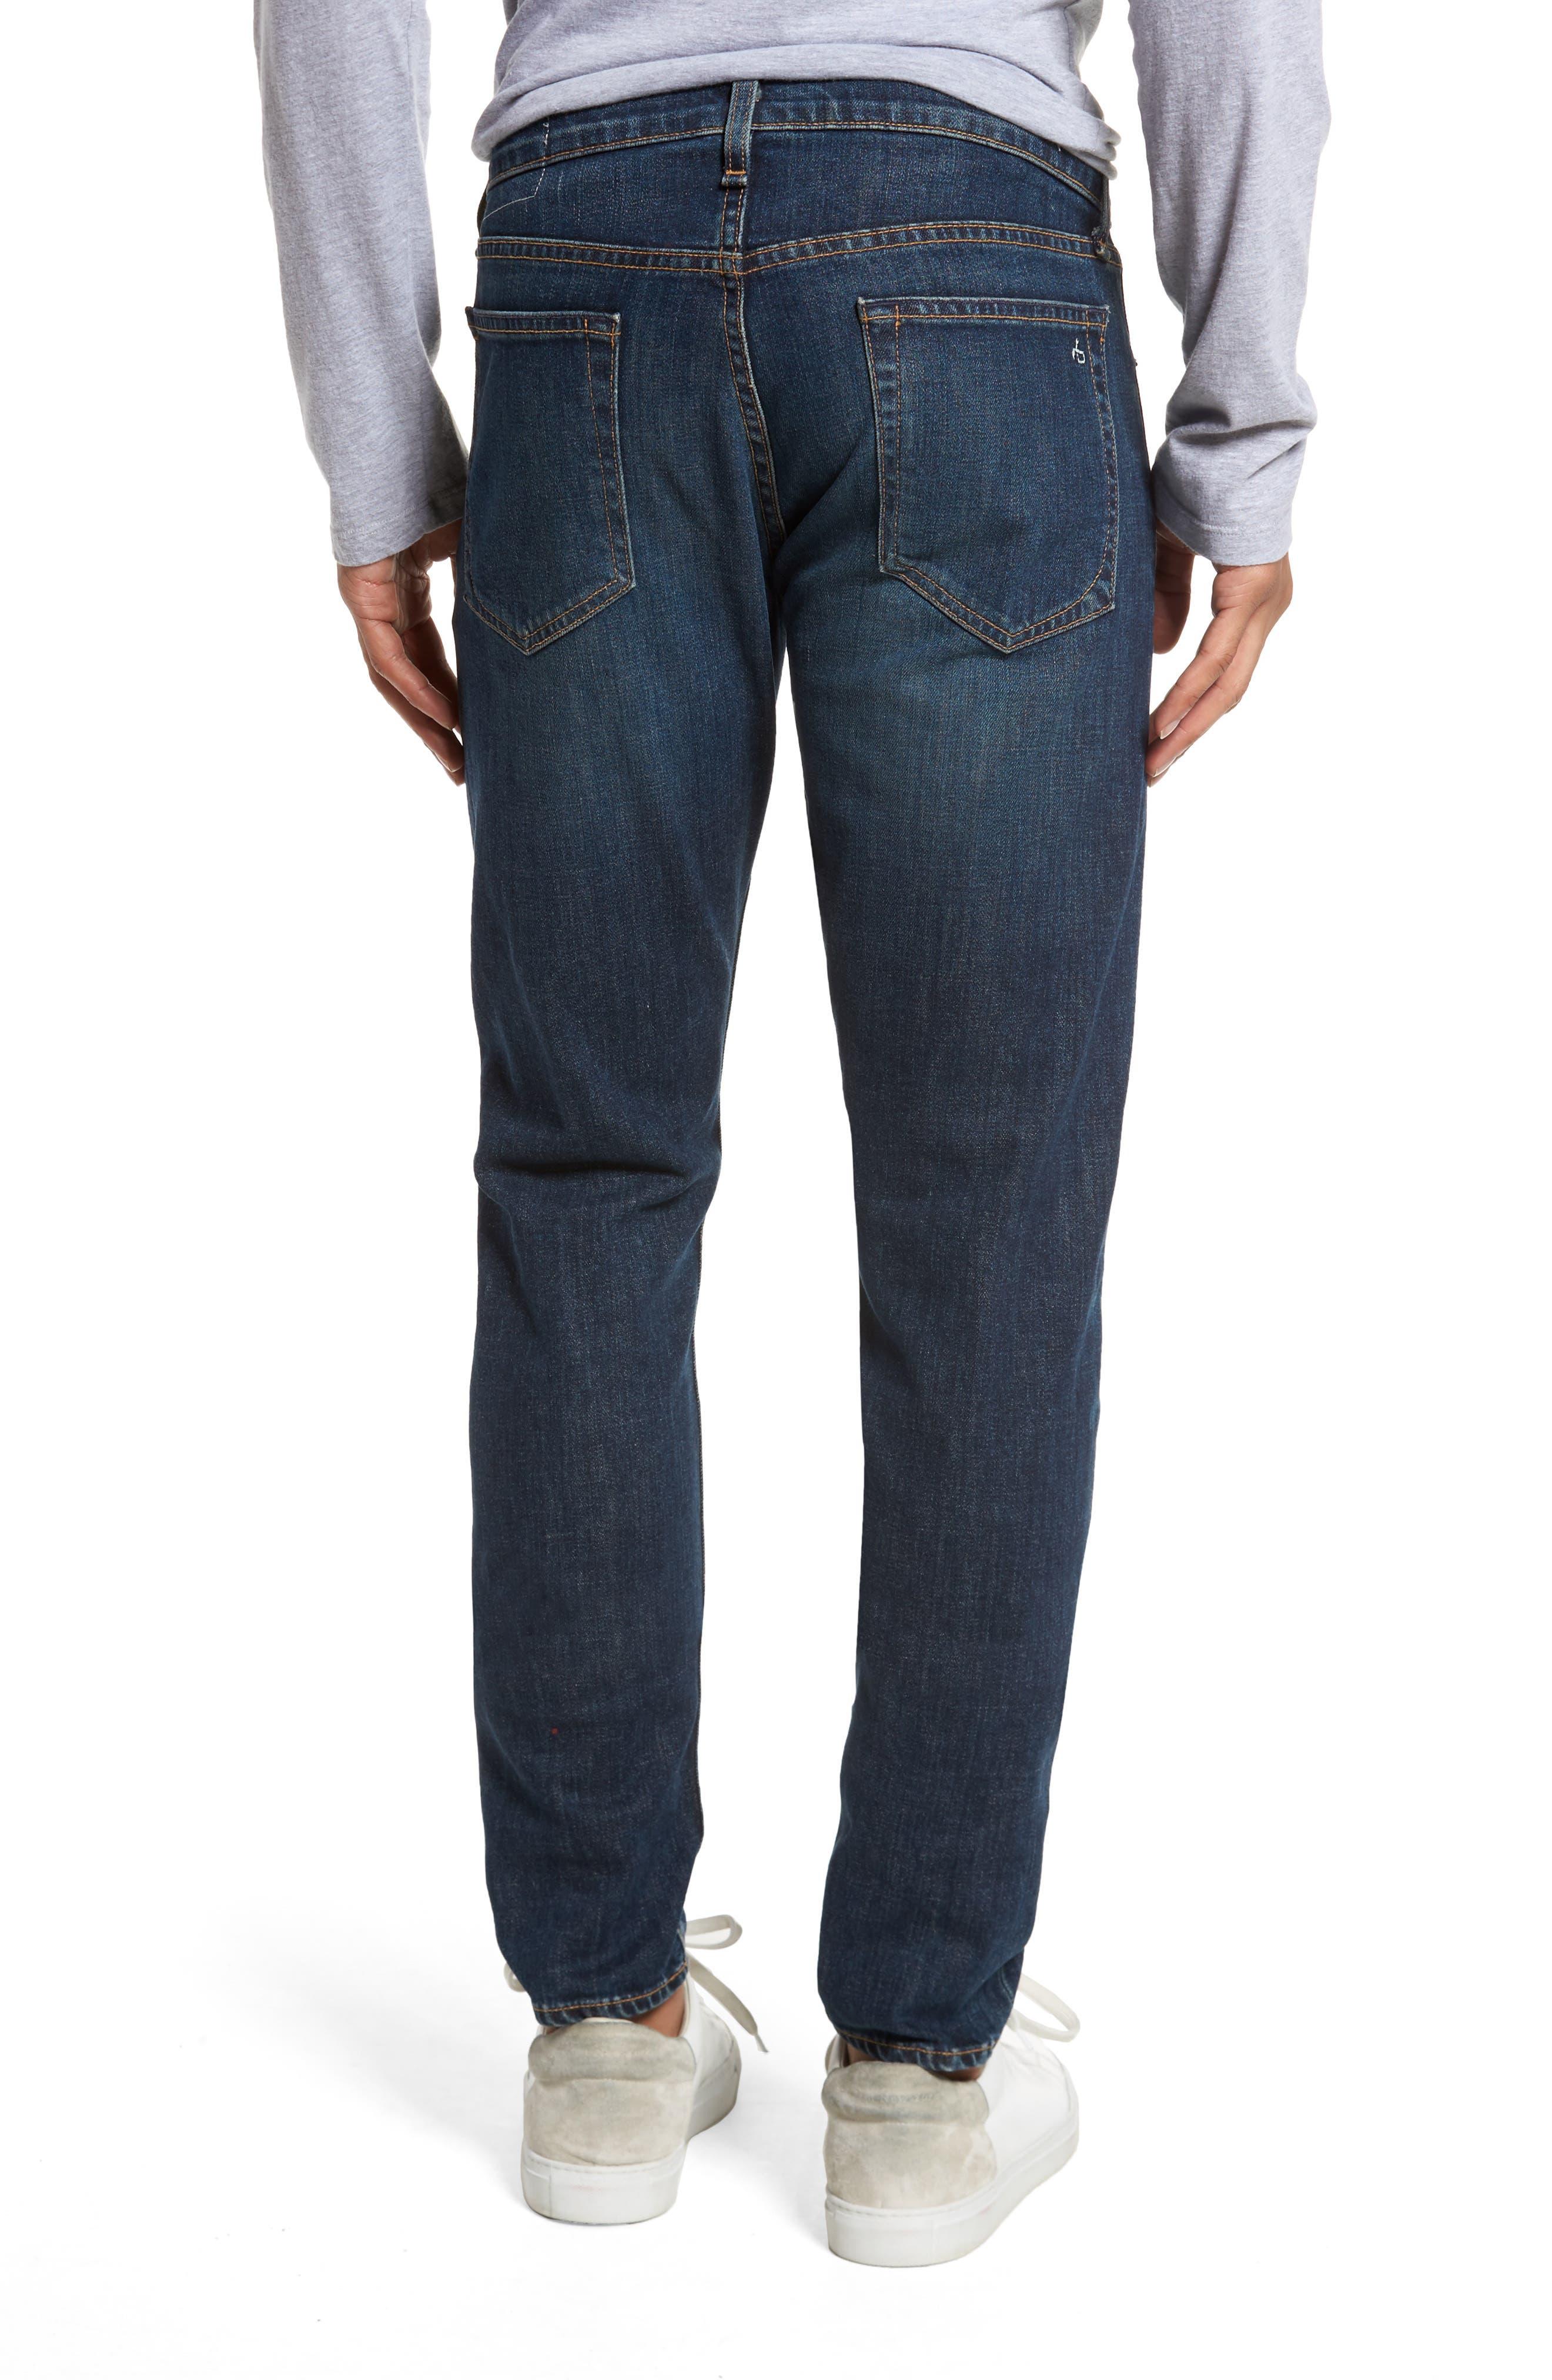 Fit 1 Skinny Fit Jeans,                             Alternate thumbnail 2, color,                             Linden